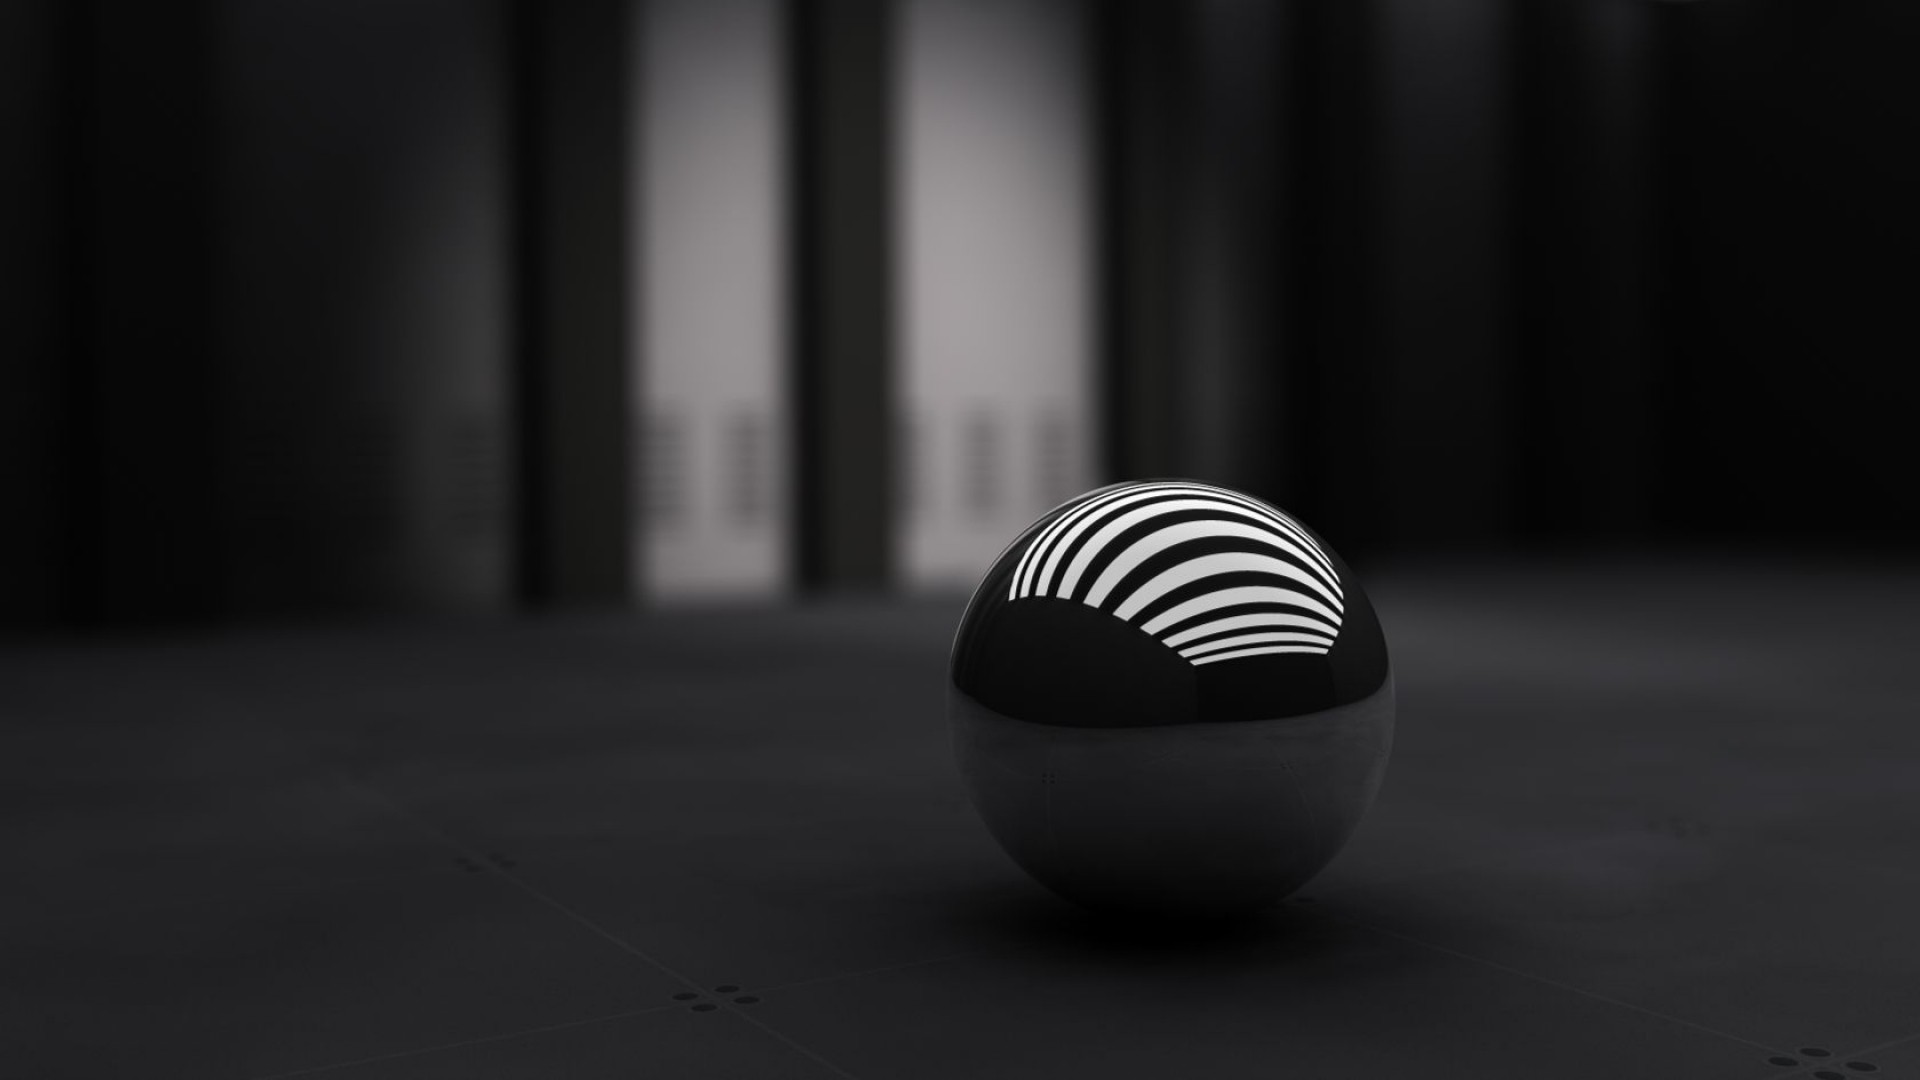 Wallpaper black, ball, band, white